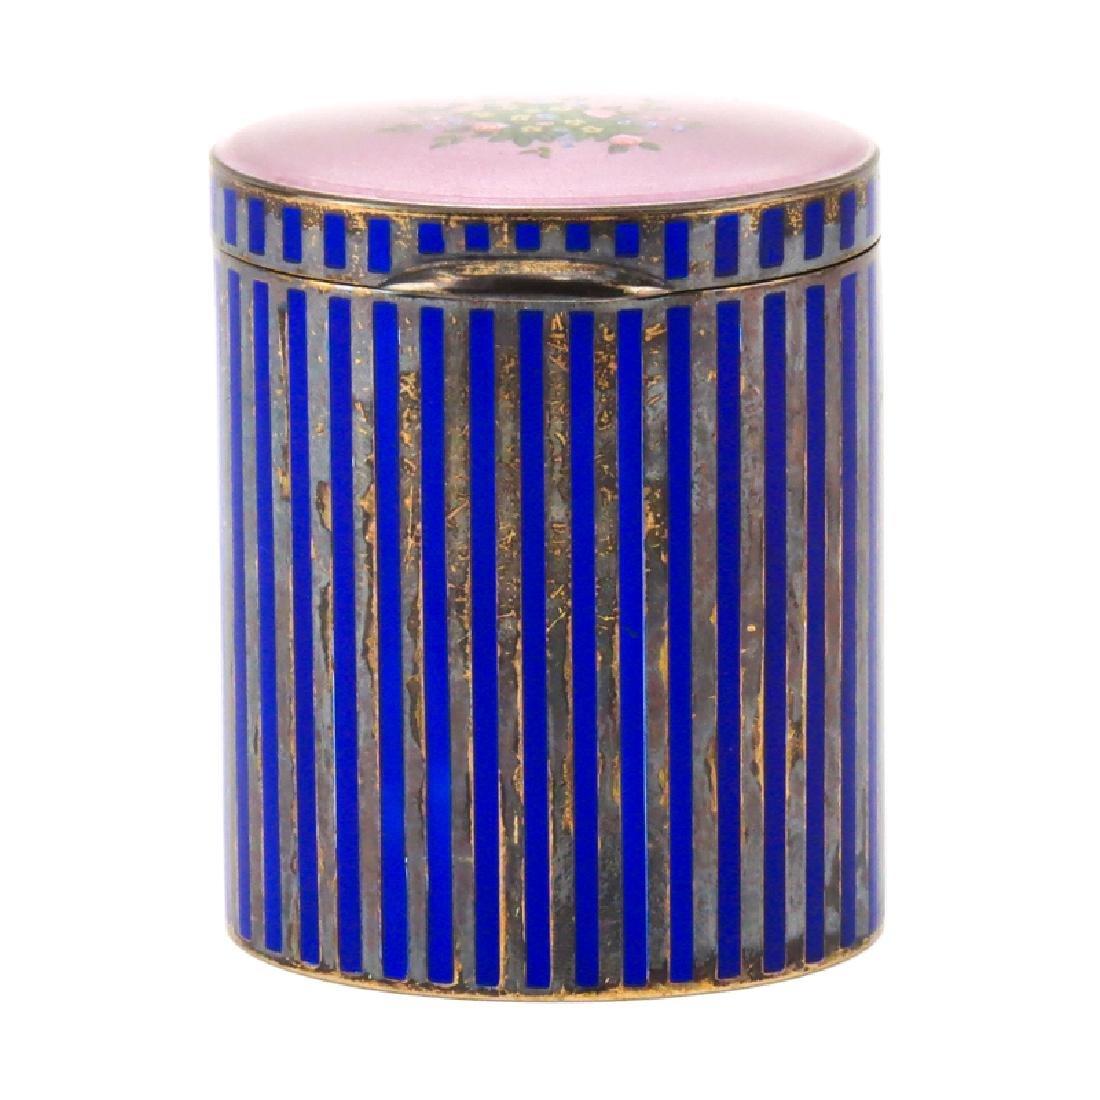 Vintage Italian Guilloche Enamel and Silver Round Box